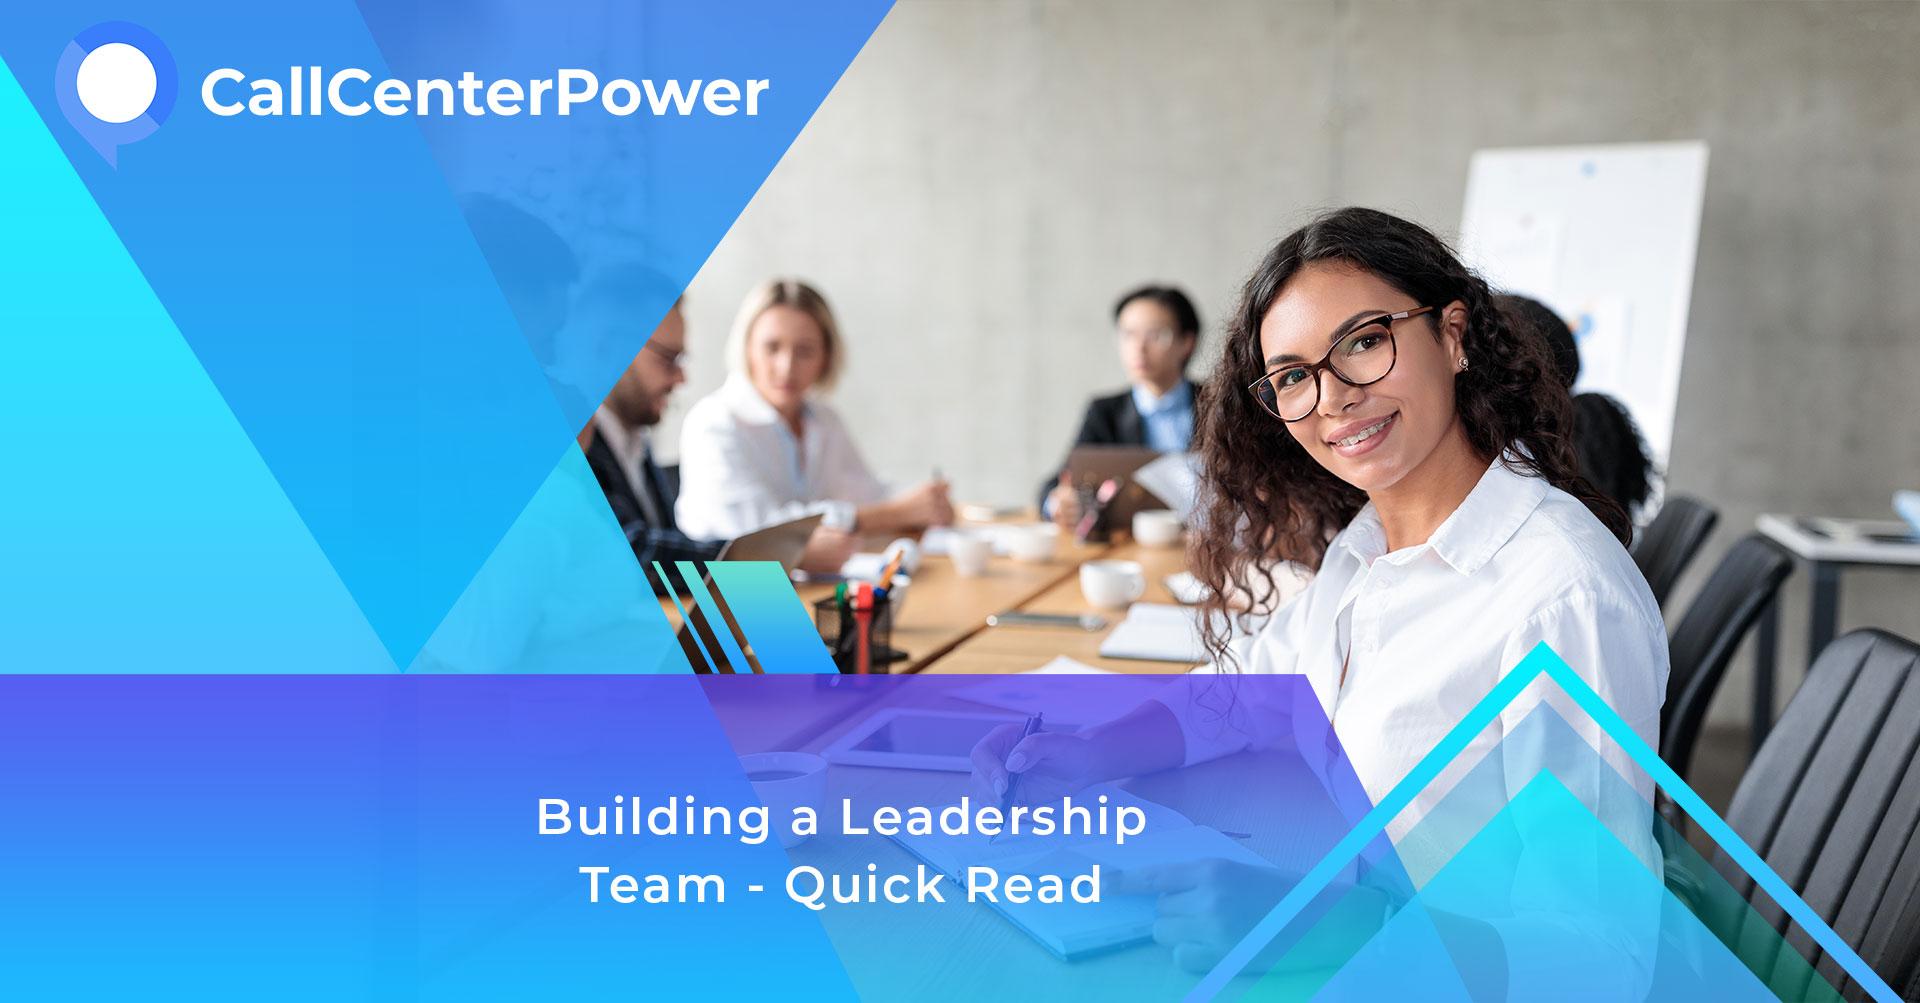 Call Center Power Leadership Team